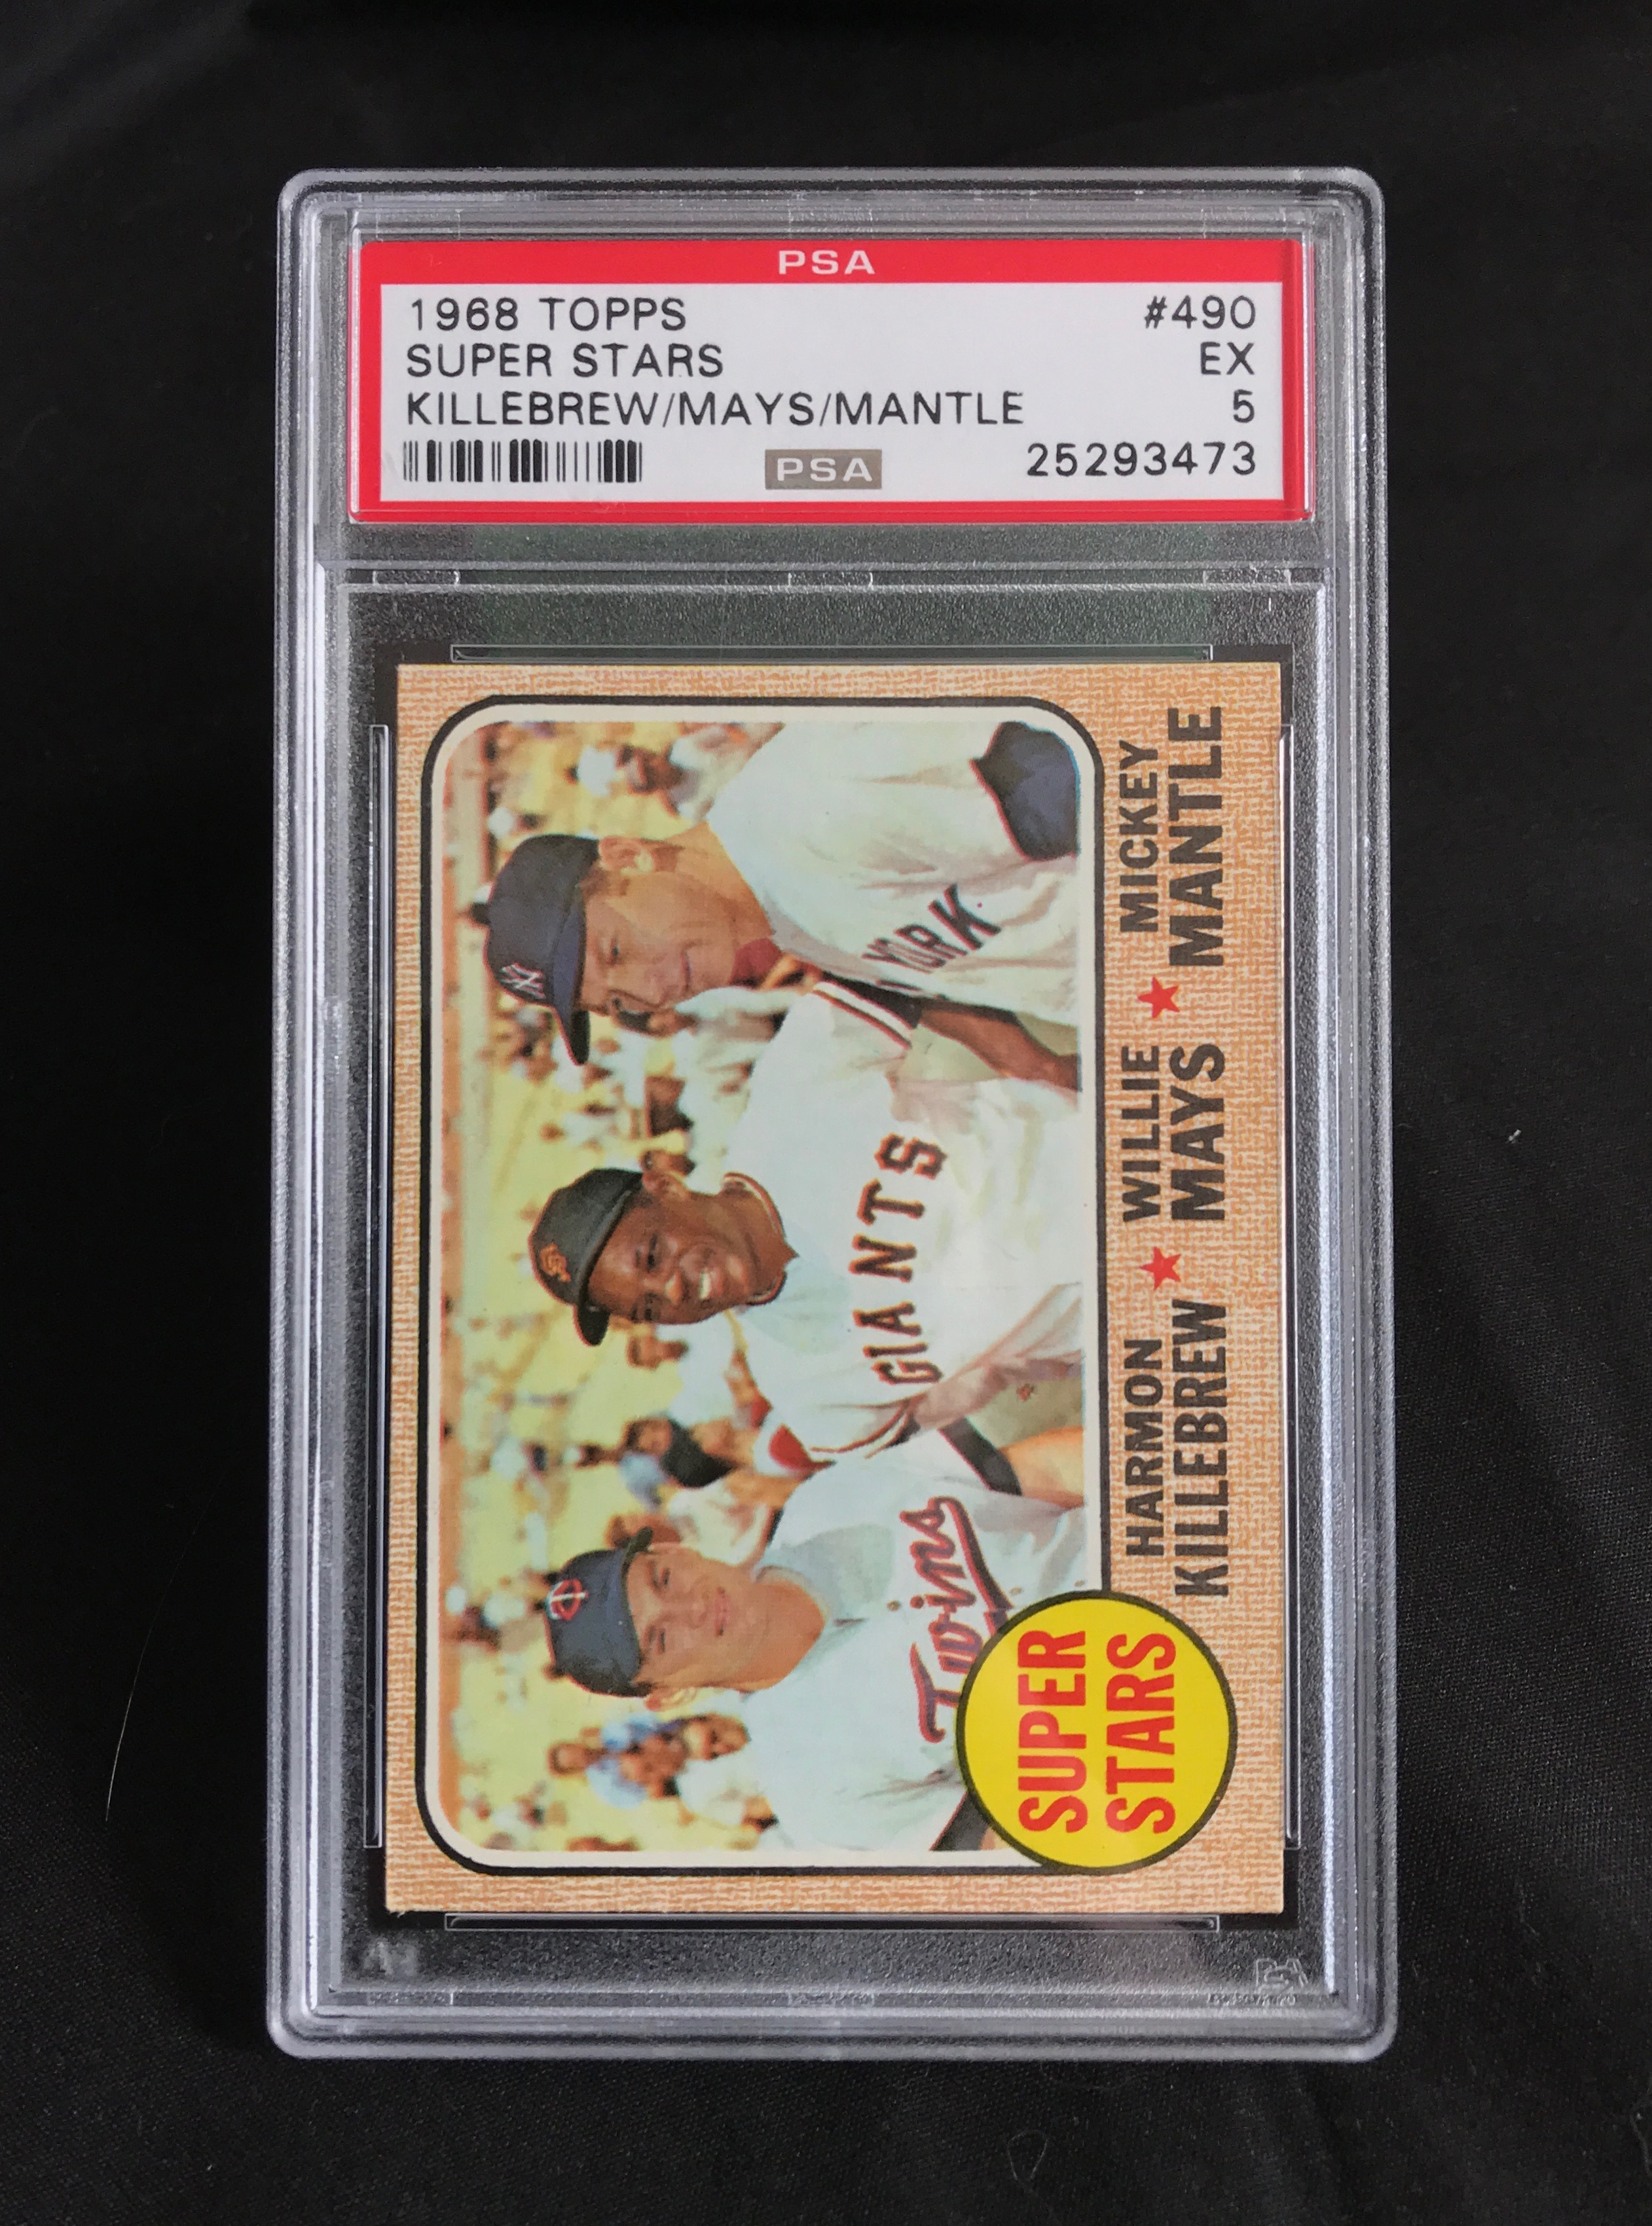 1968 Topps Super Stars Killebrew, Mays, Mantle Baseball Card PSA 5